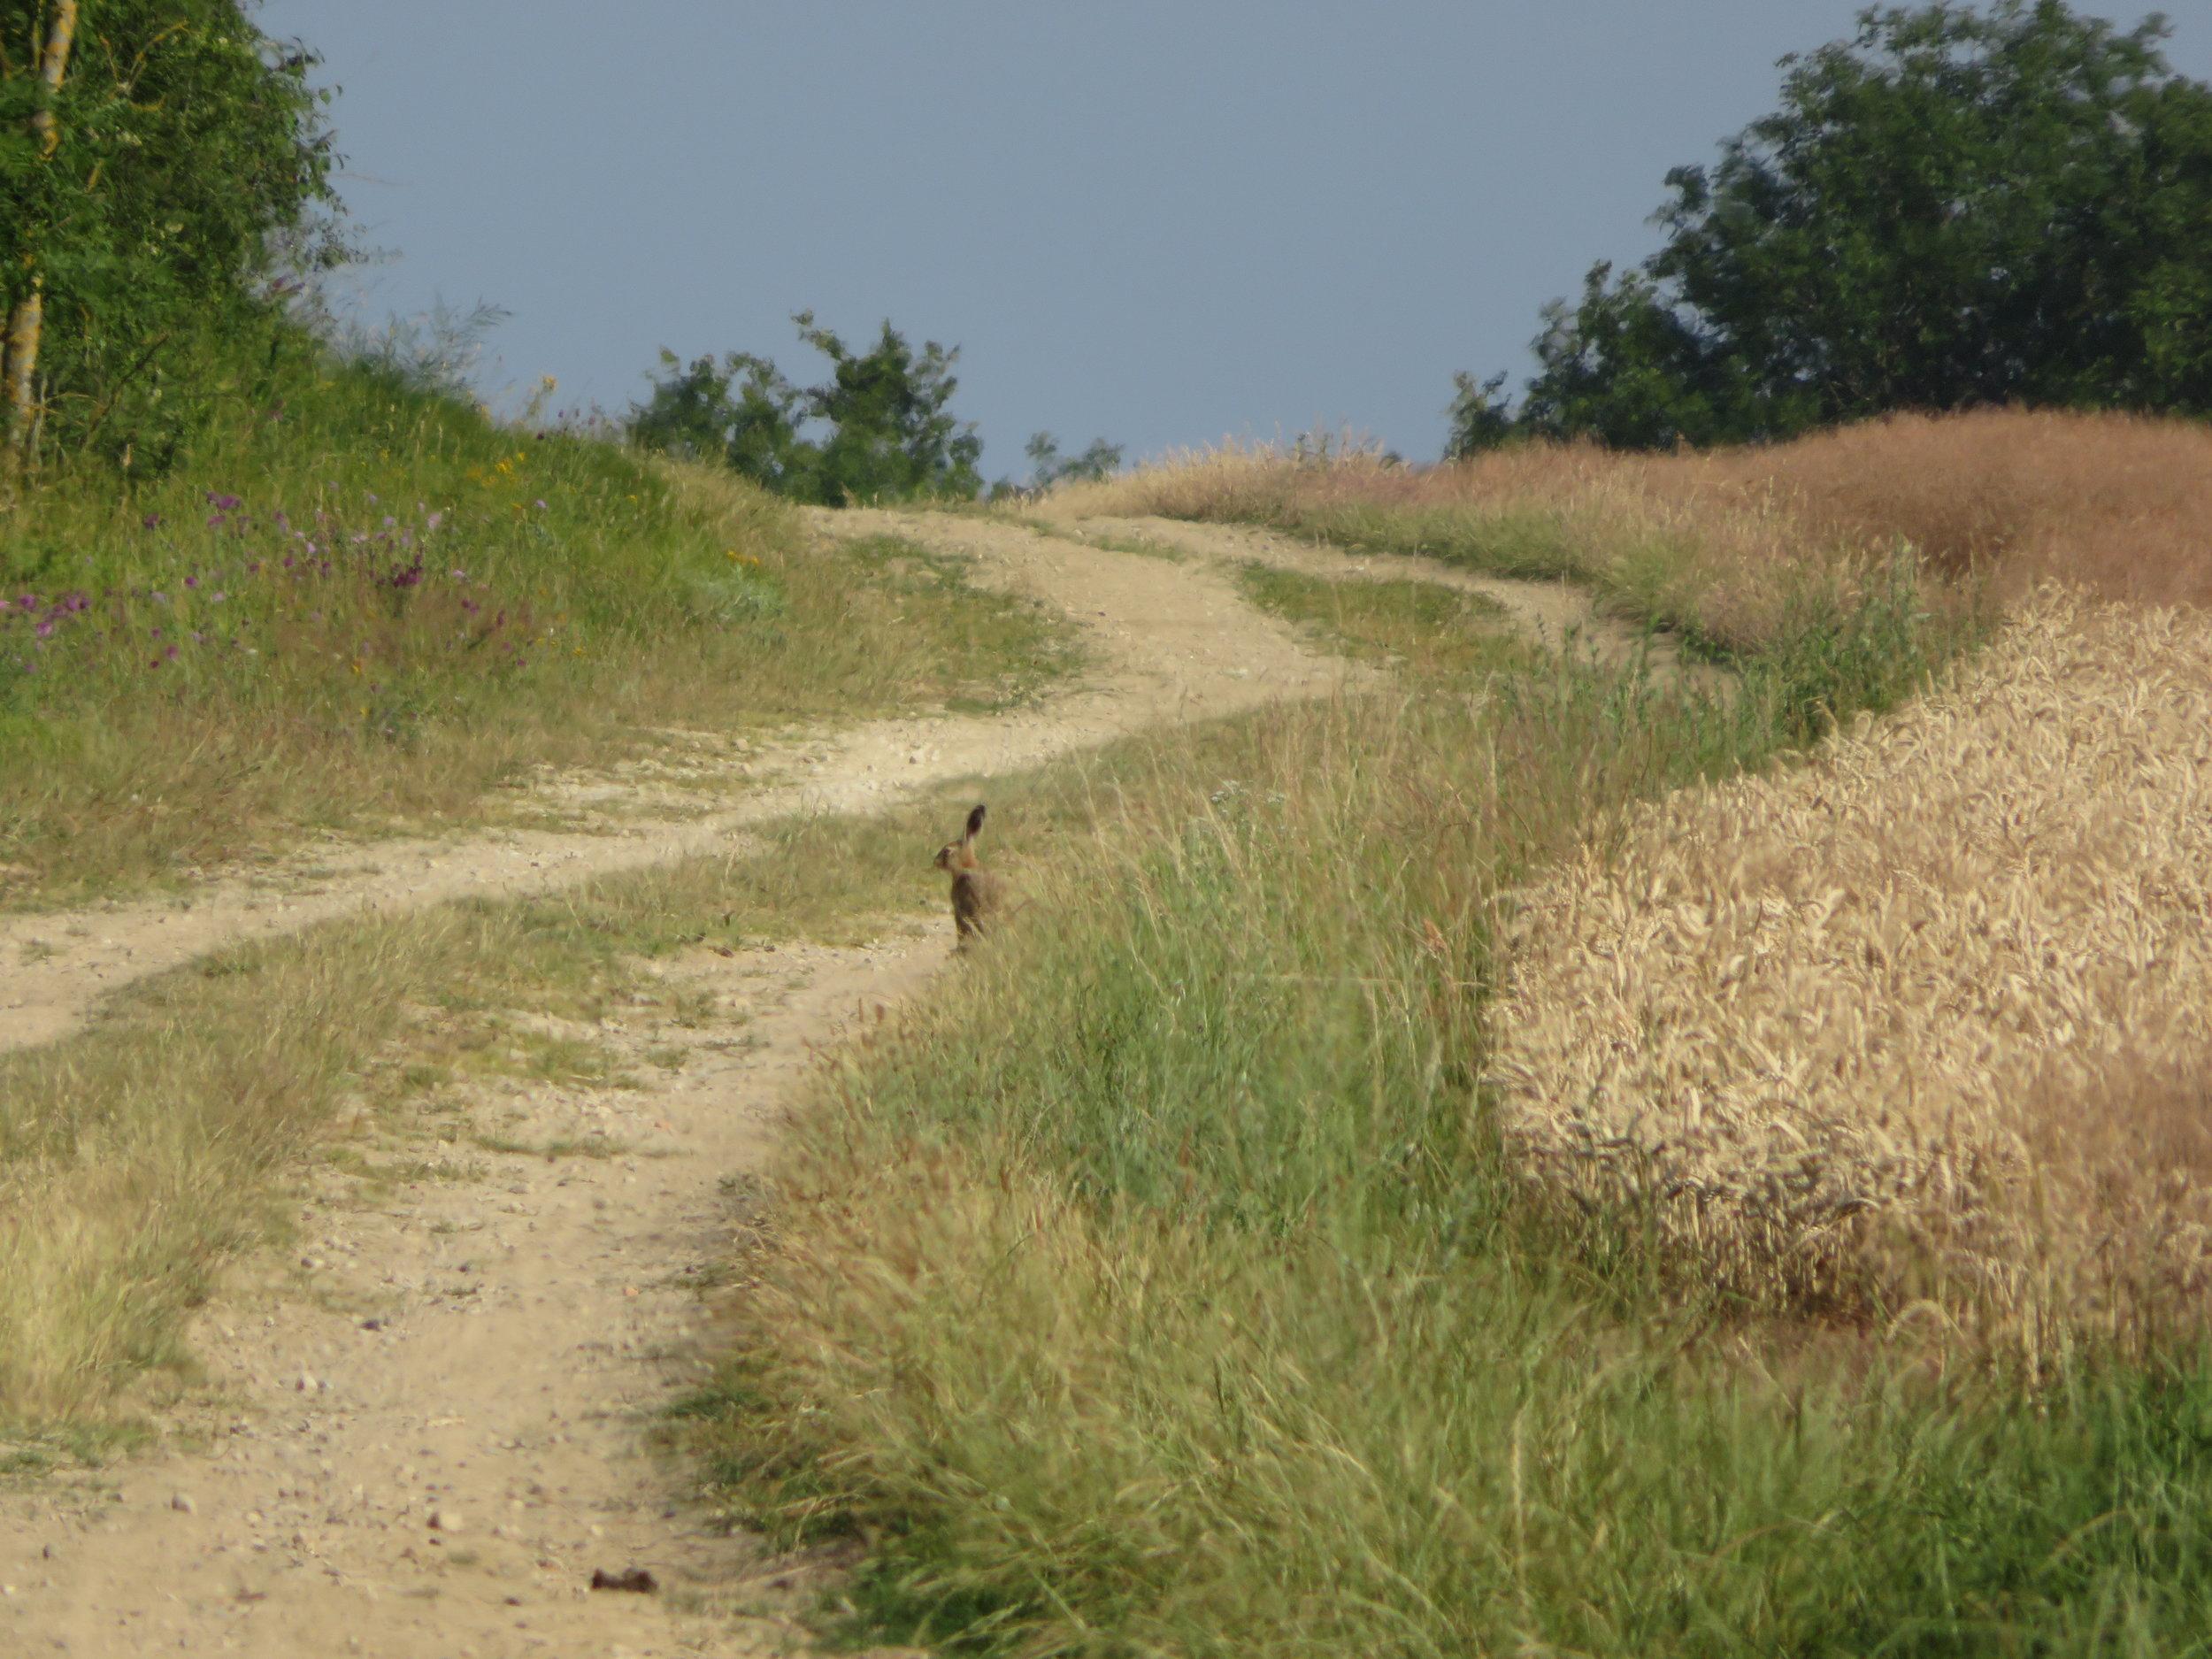 Farm roads and ...